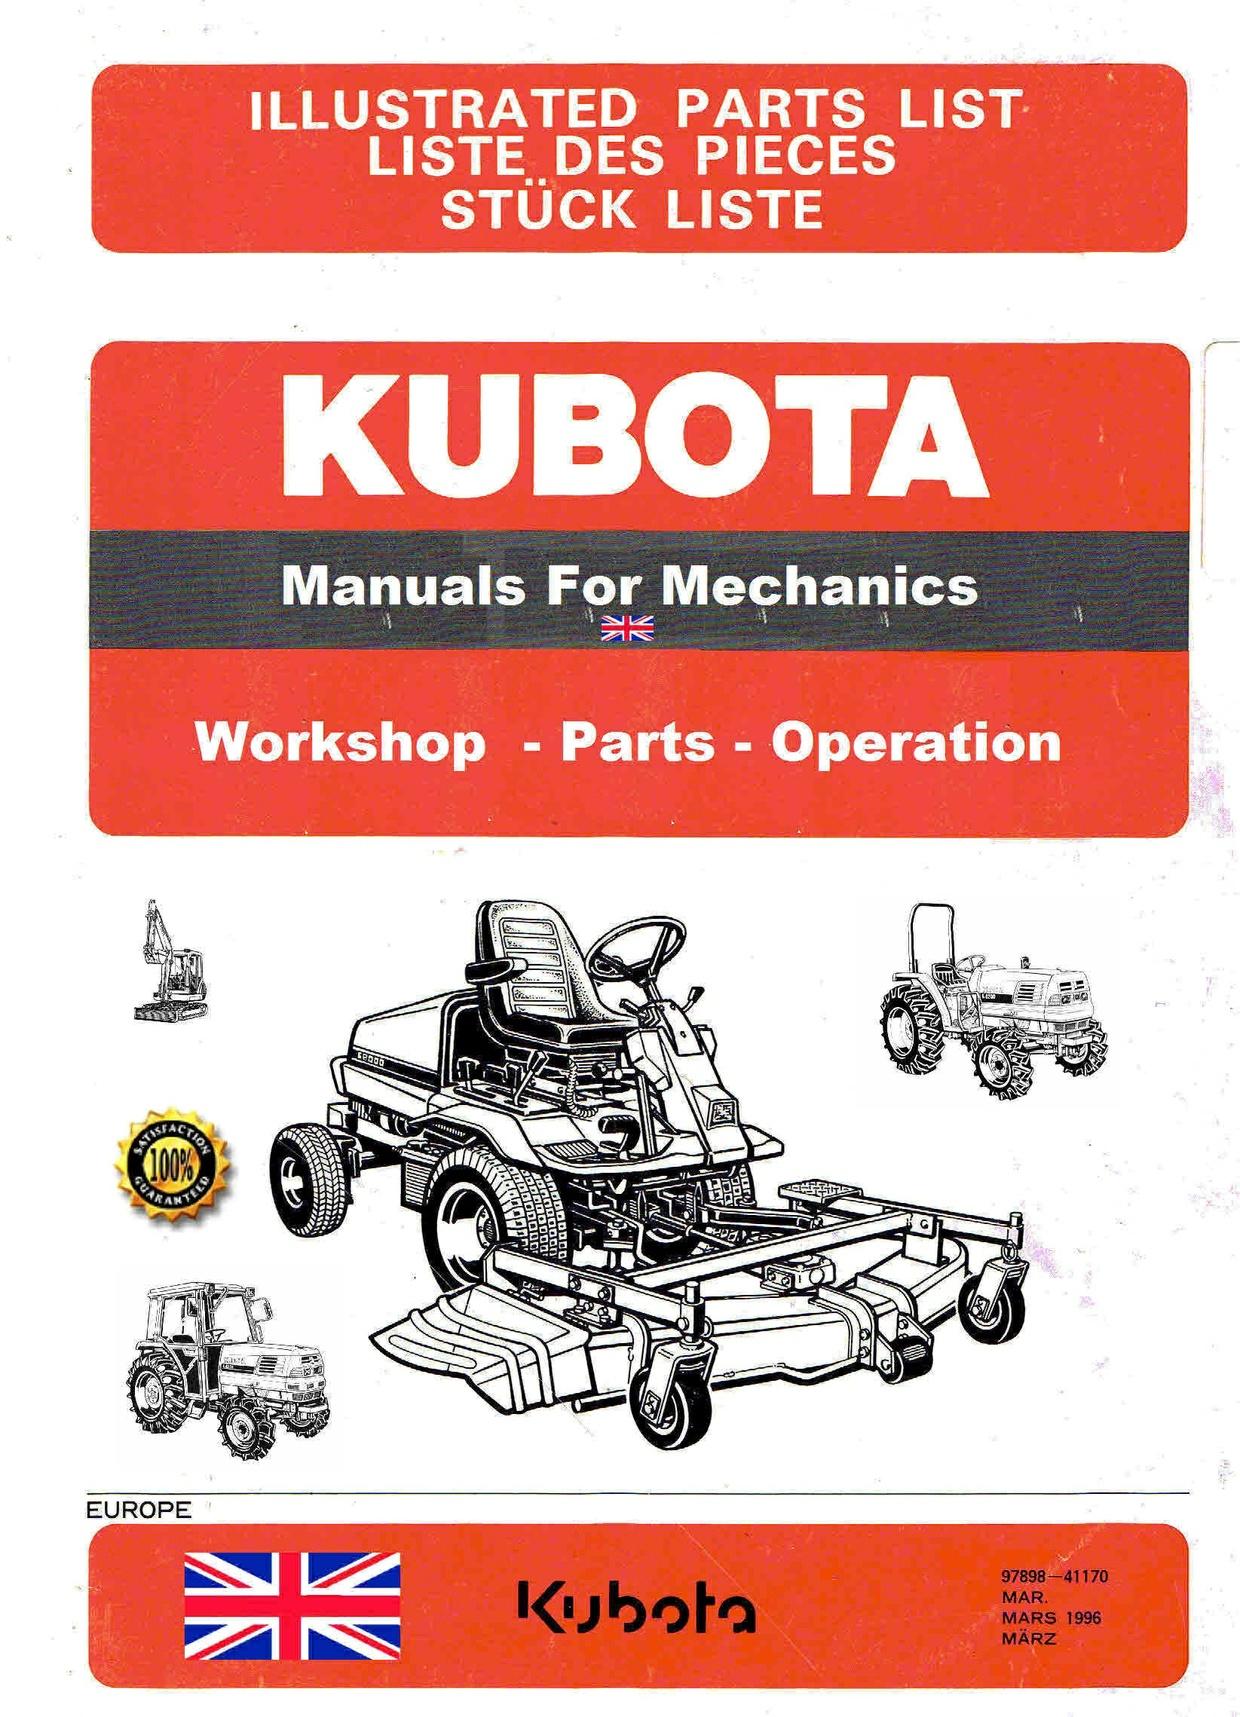 Kubota manuals for mechanics themanualman sellfy kubota manuals for mechanics sciox Images